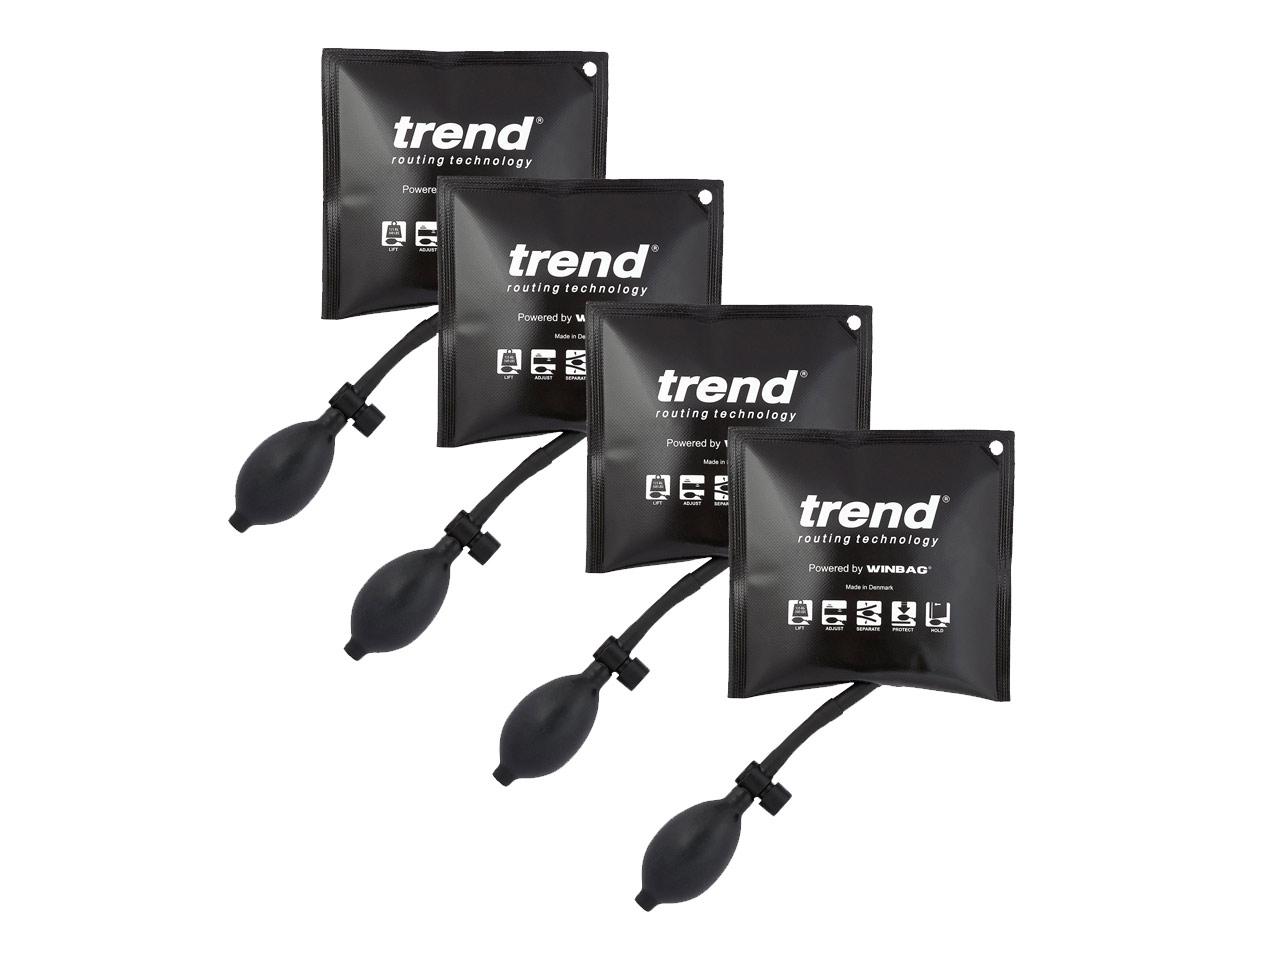 Trend_WINBAG4PK.jpg